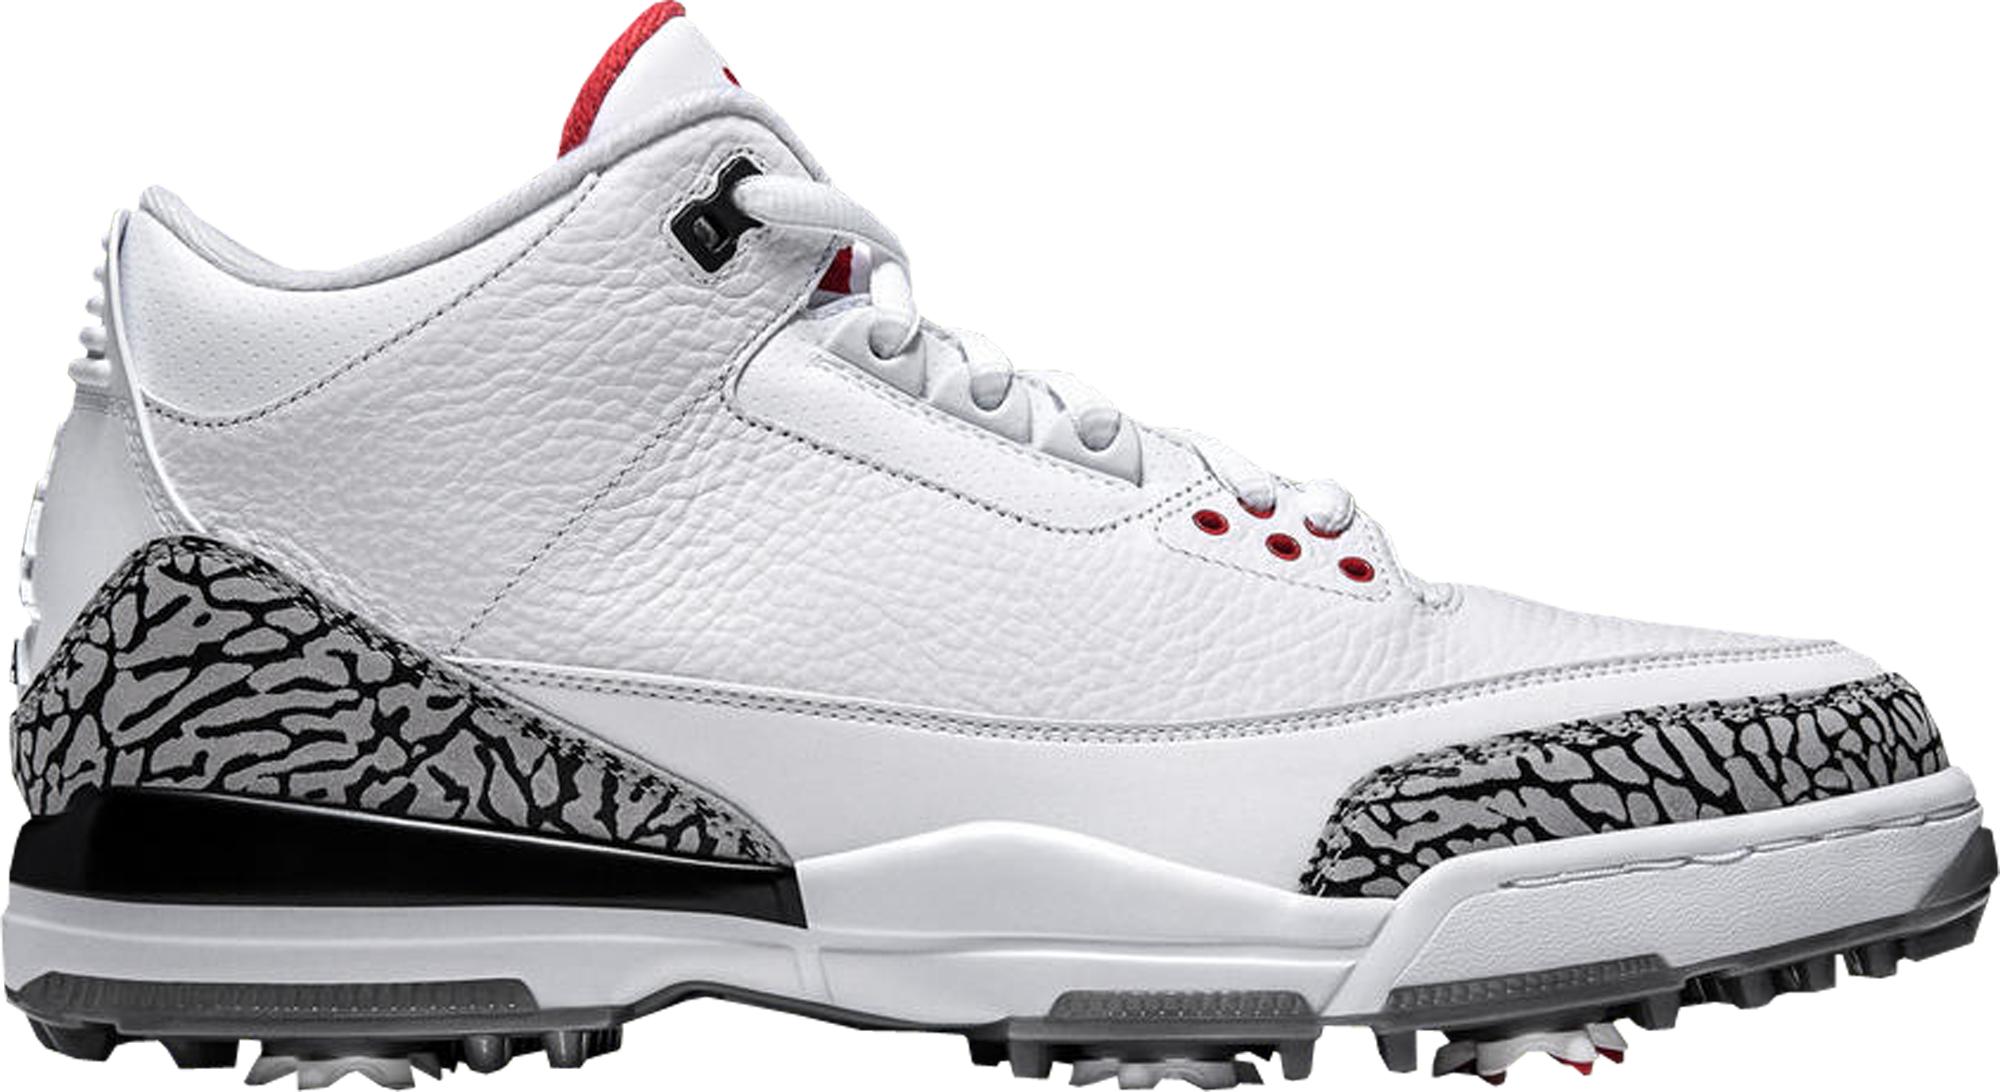 Jordan 3 Retro Golf White Cement